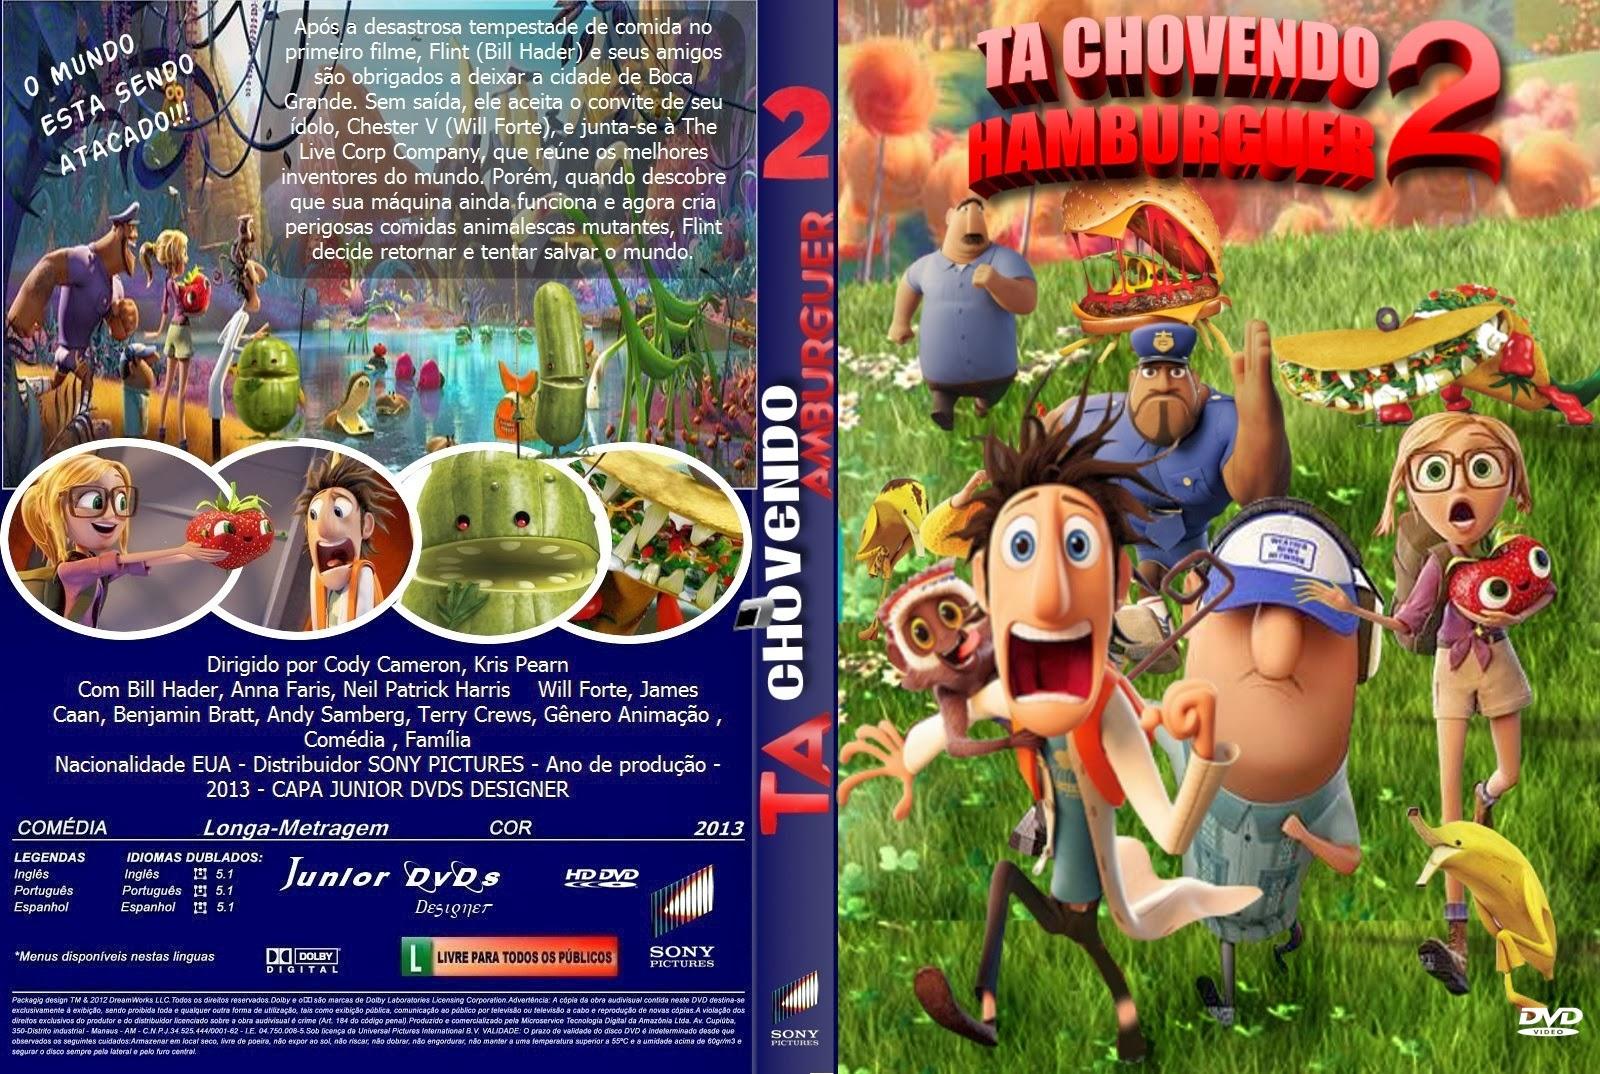 Filme Ta Chovendo Hamburguer Dublado Completo inside download tá chovendo hambúrguer 2 r5 xvid dublado